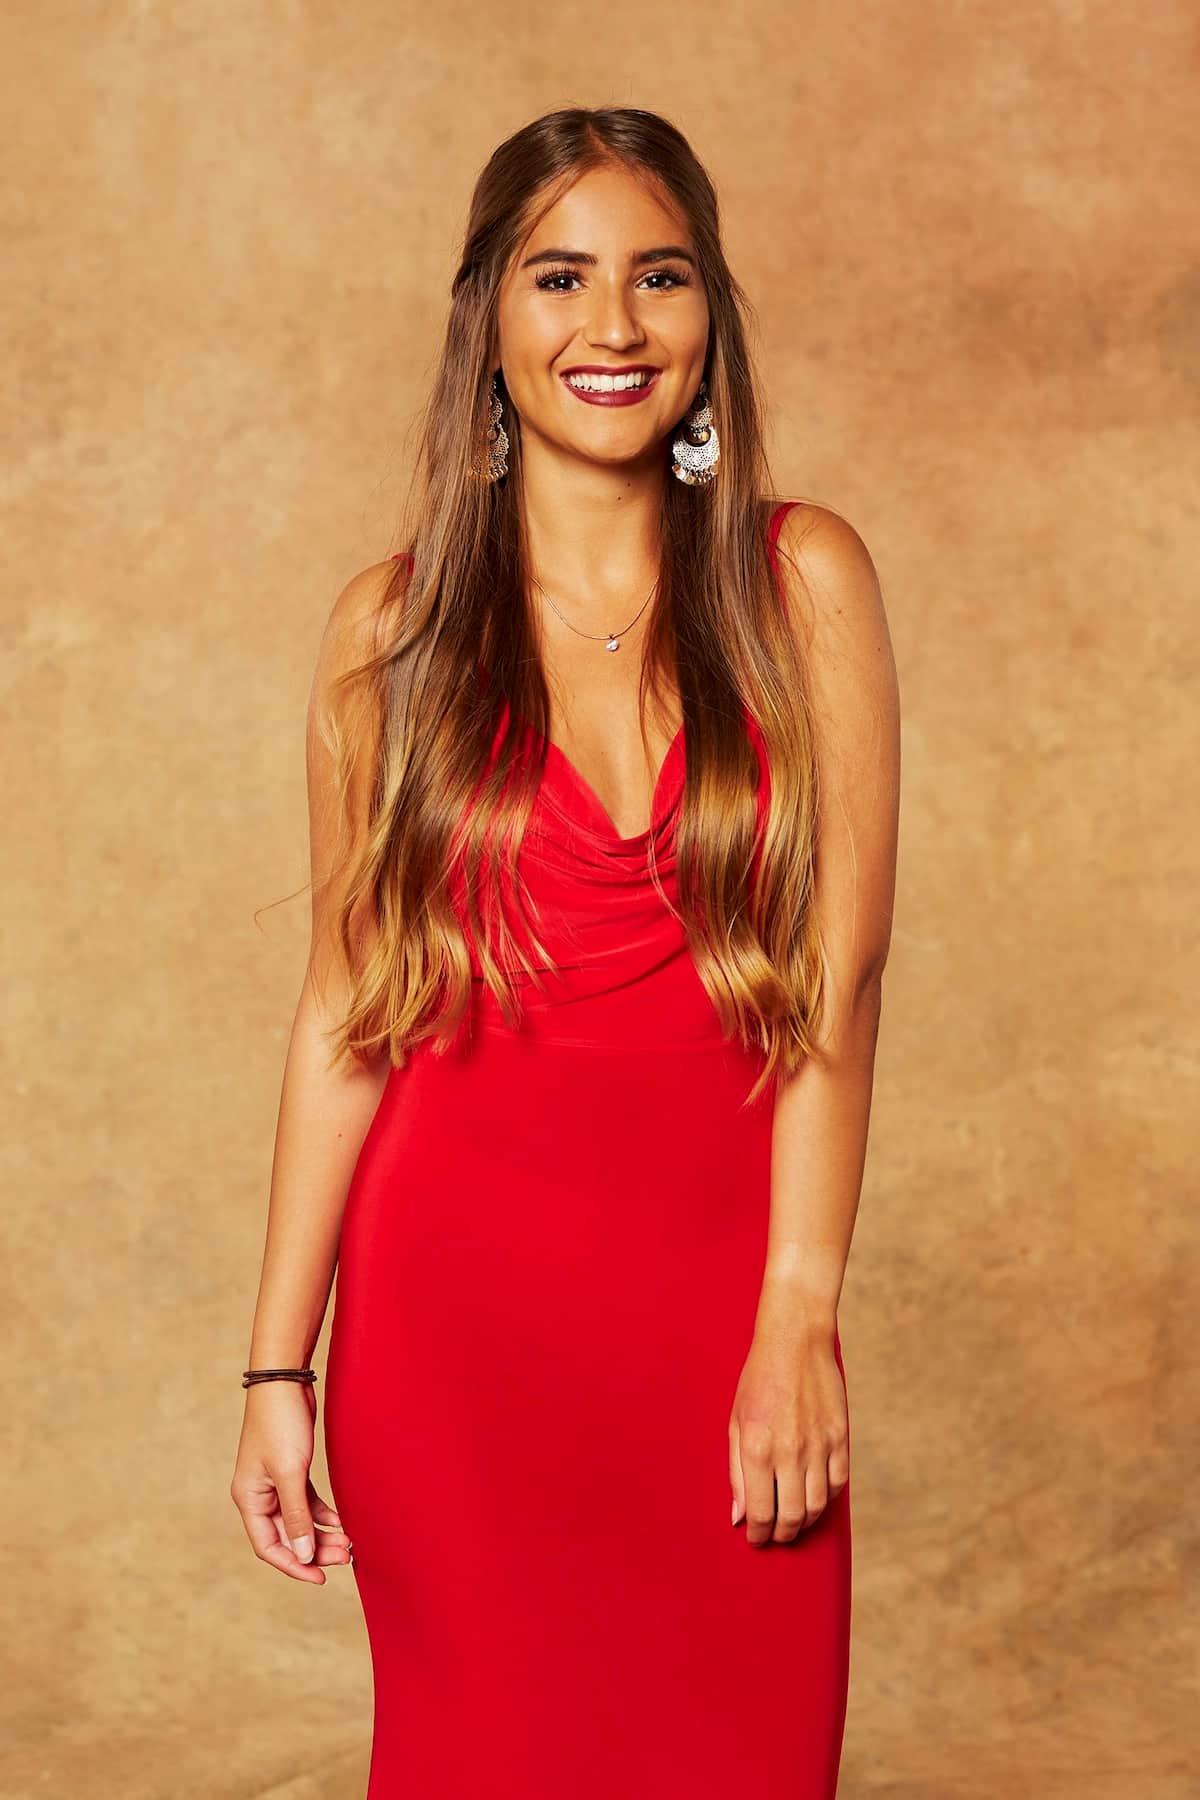 Nina als Kandidatin beim Bachelor 2021